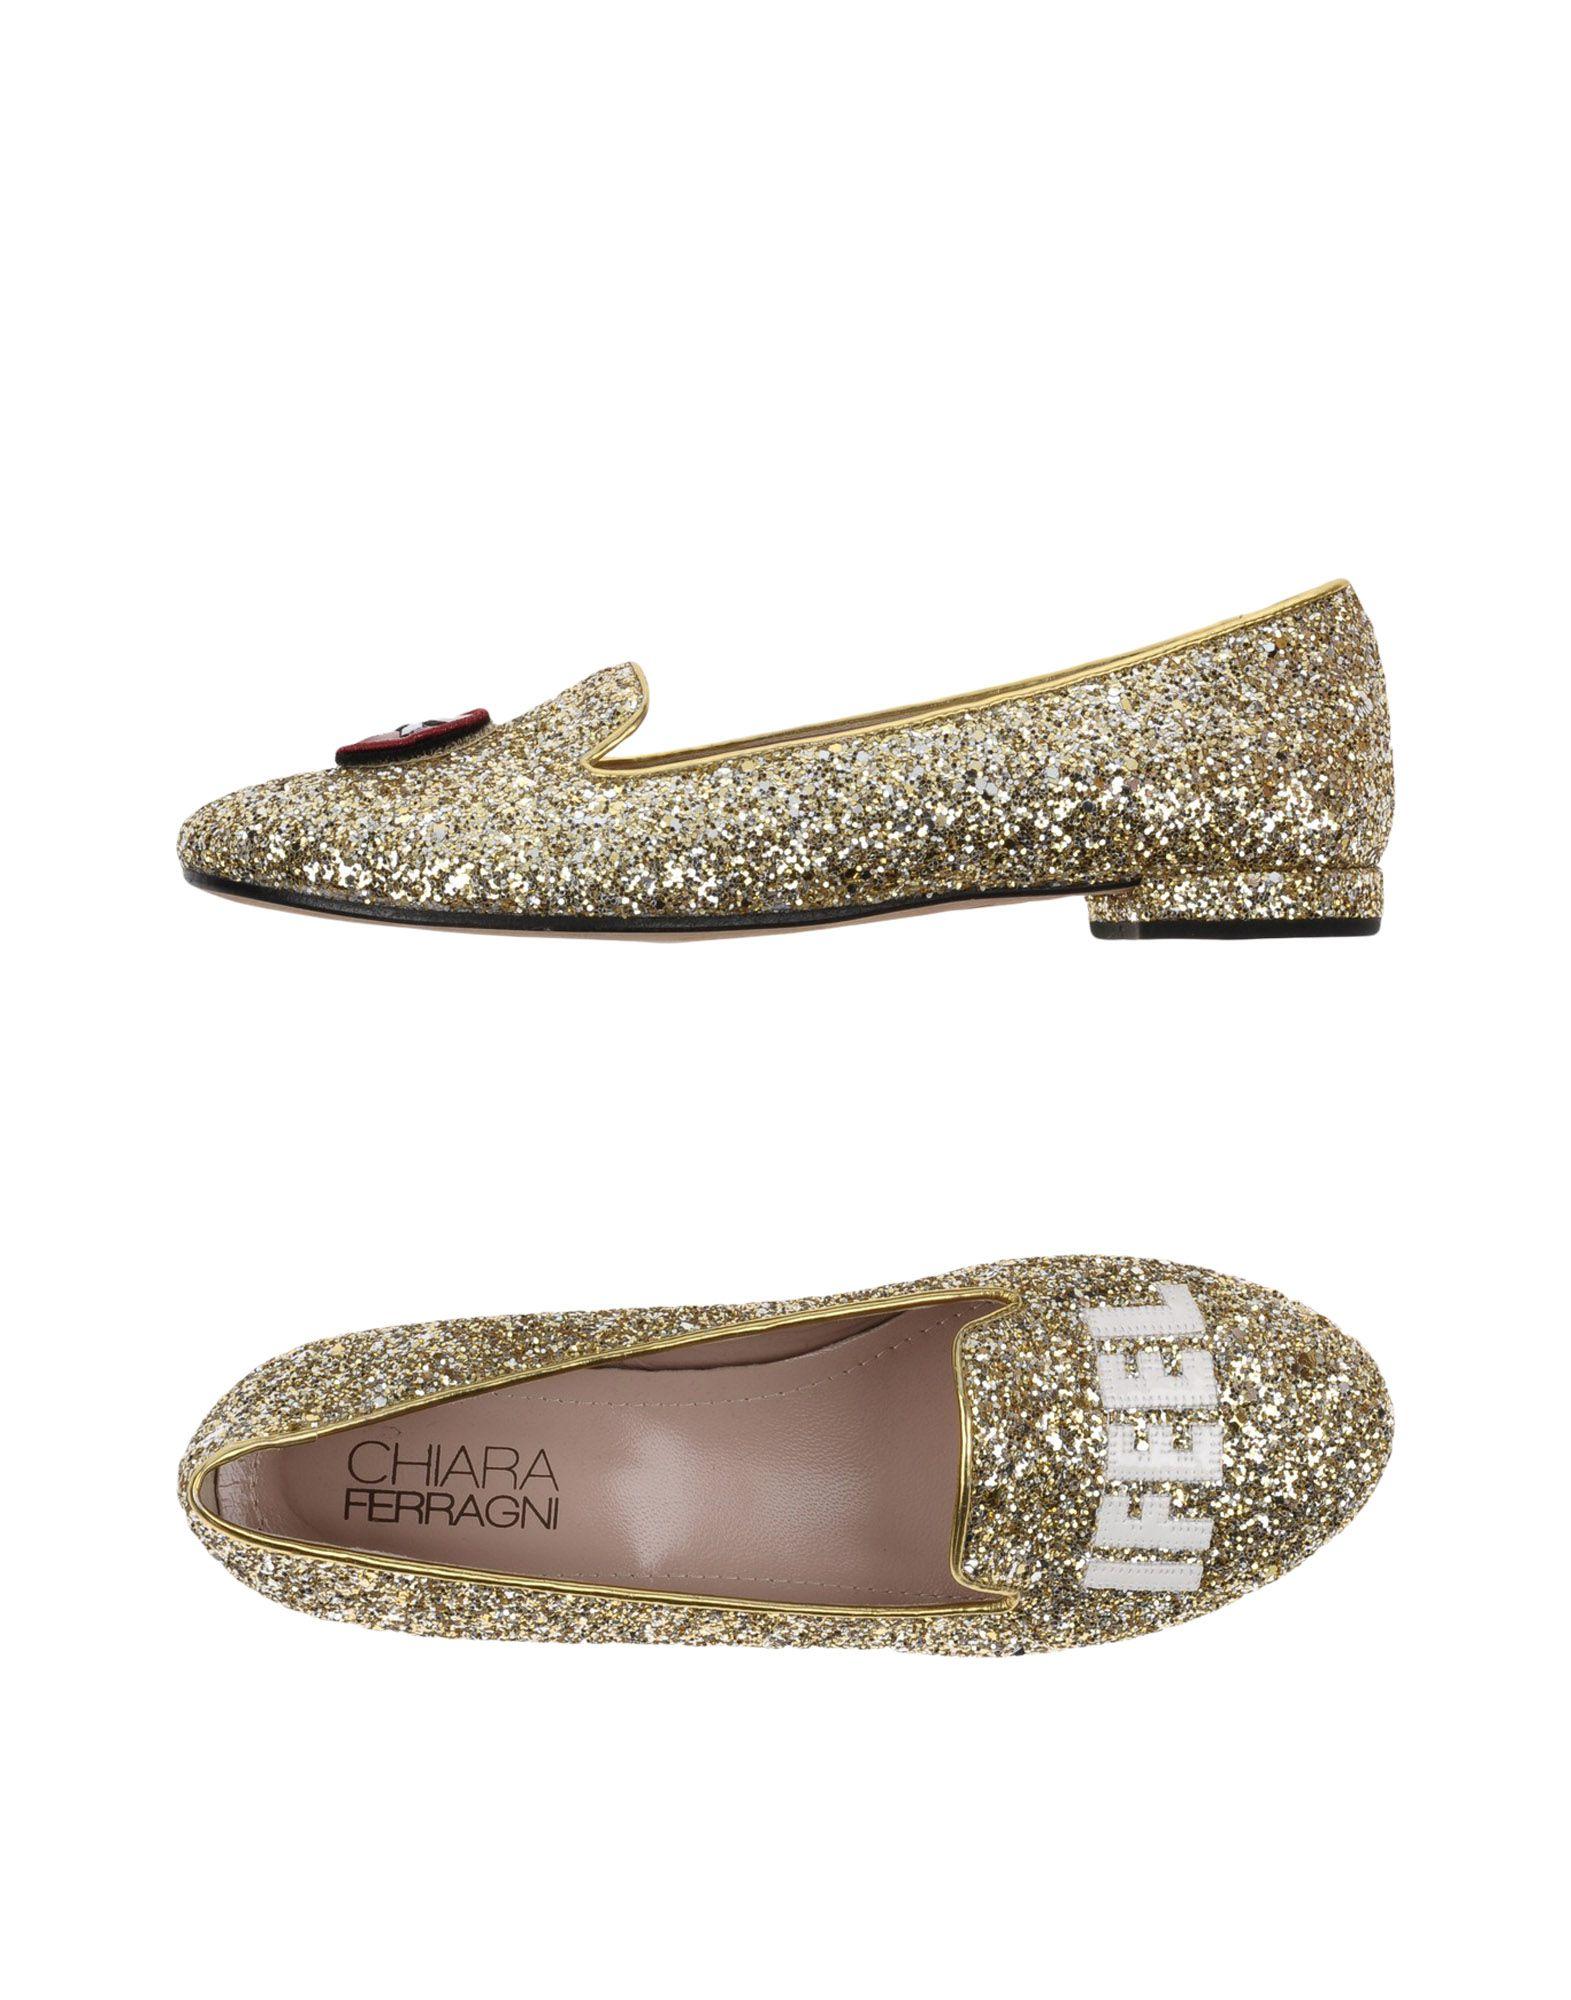 Stilvolle billige Mokassins Schuhe Chiara Ferragni Mokassins billige Damen  11347125WE 27f60c